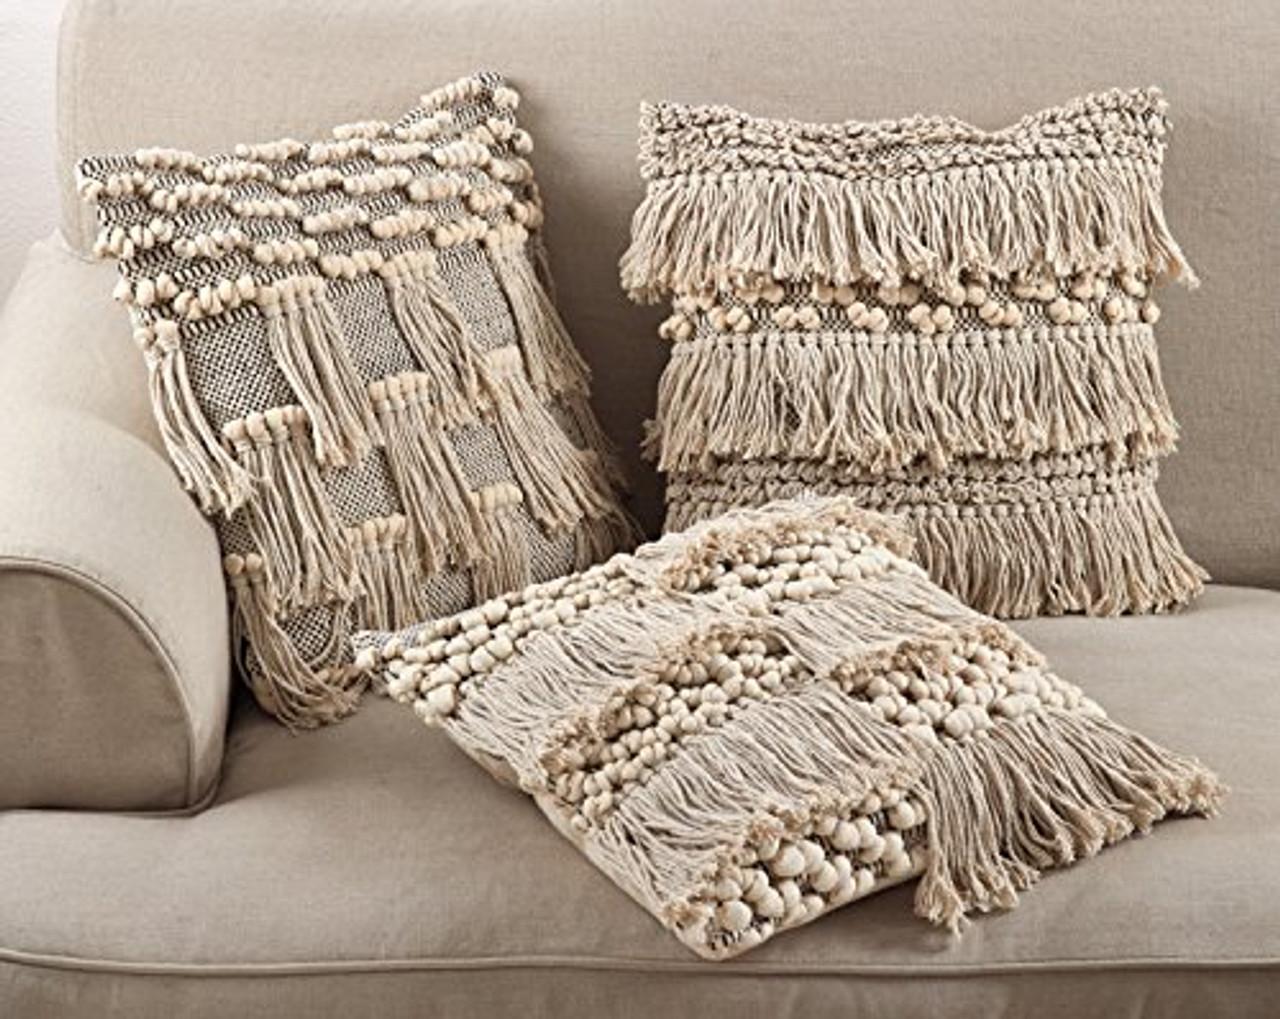 Moroccan Wedding Blanket Style Design Fringe Cotton Down Filled